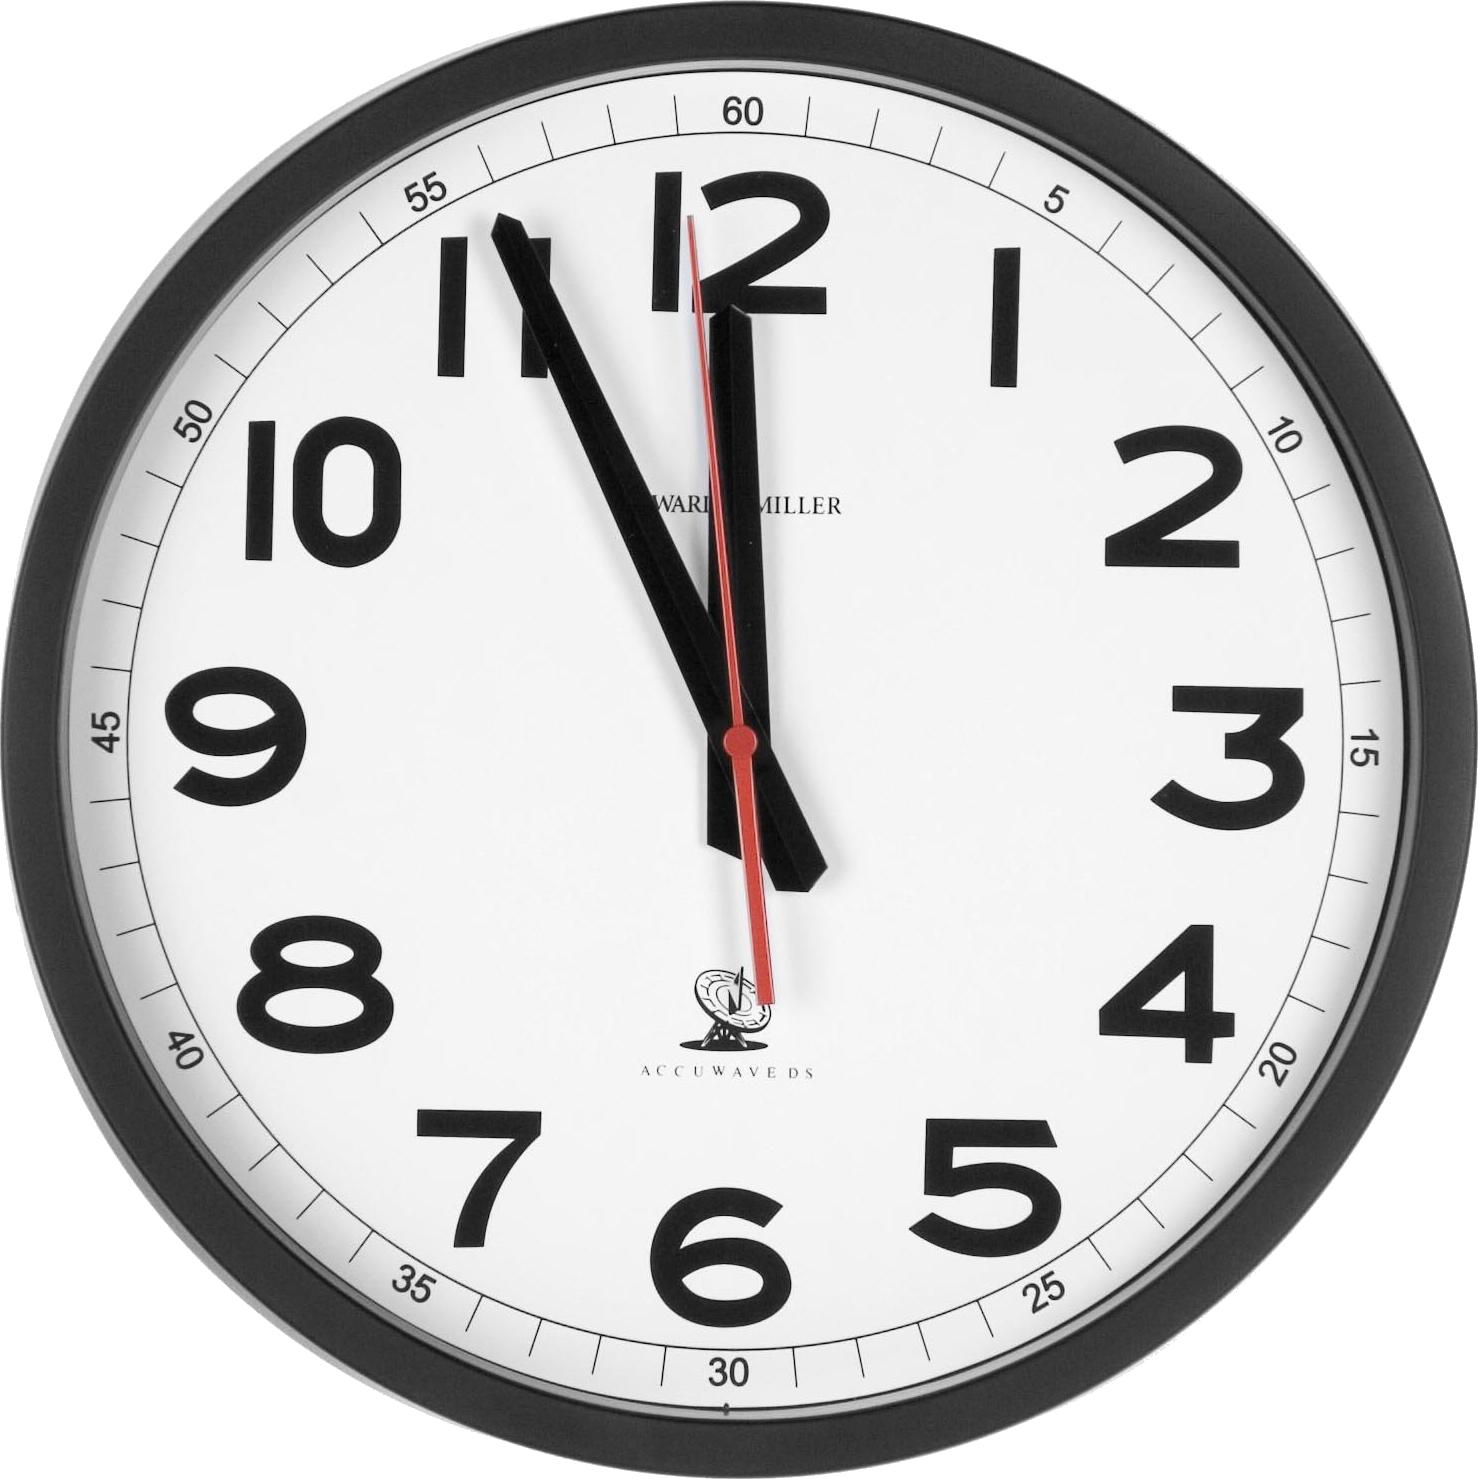 Hq clock png transparent. Clocks clipart clear background